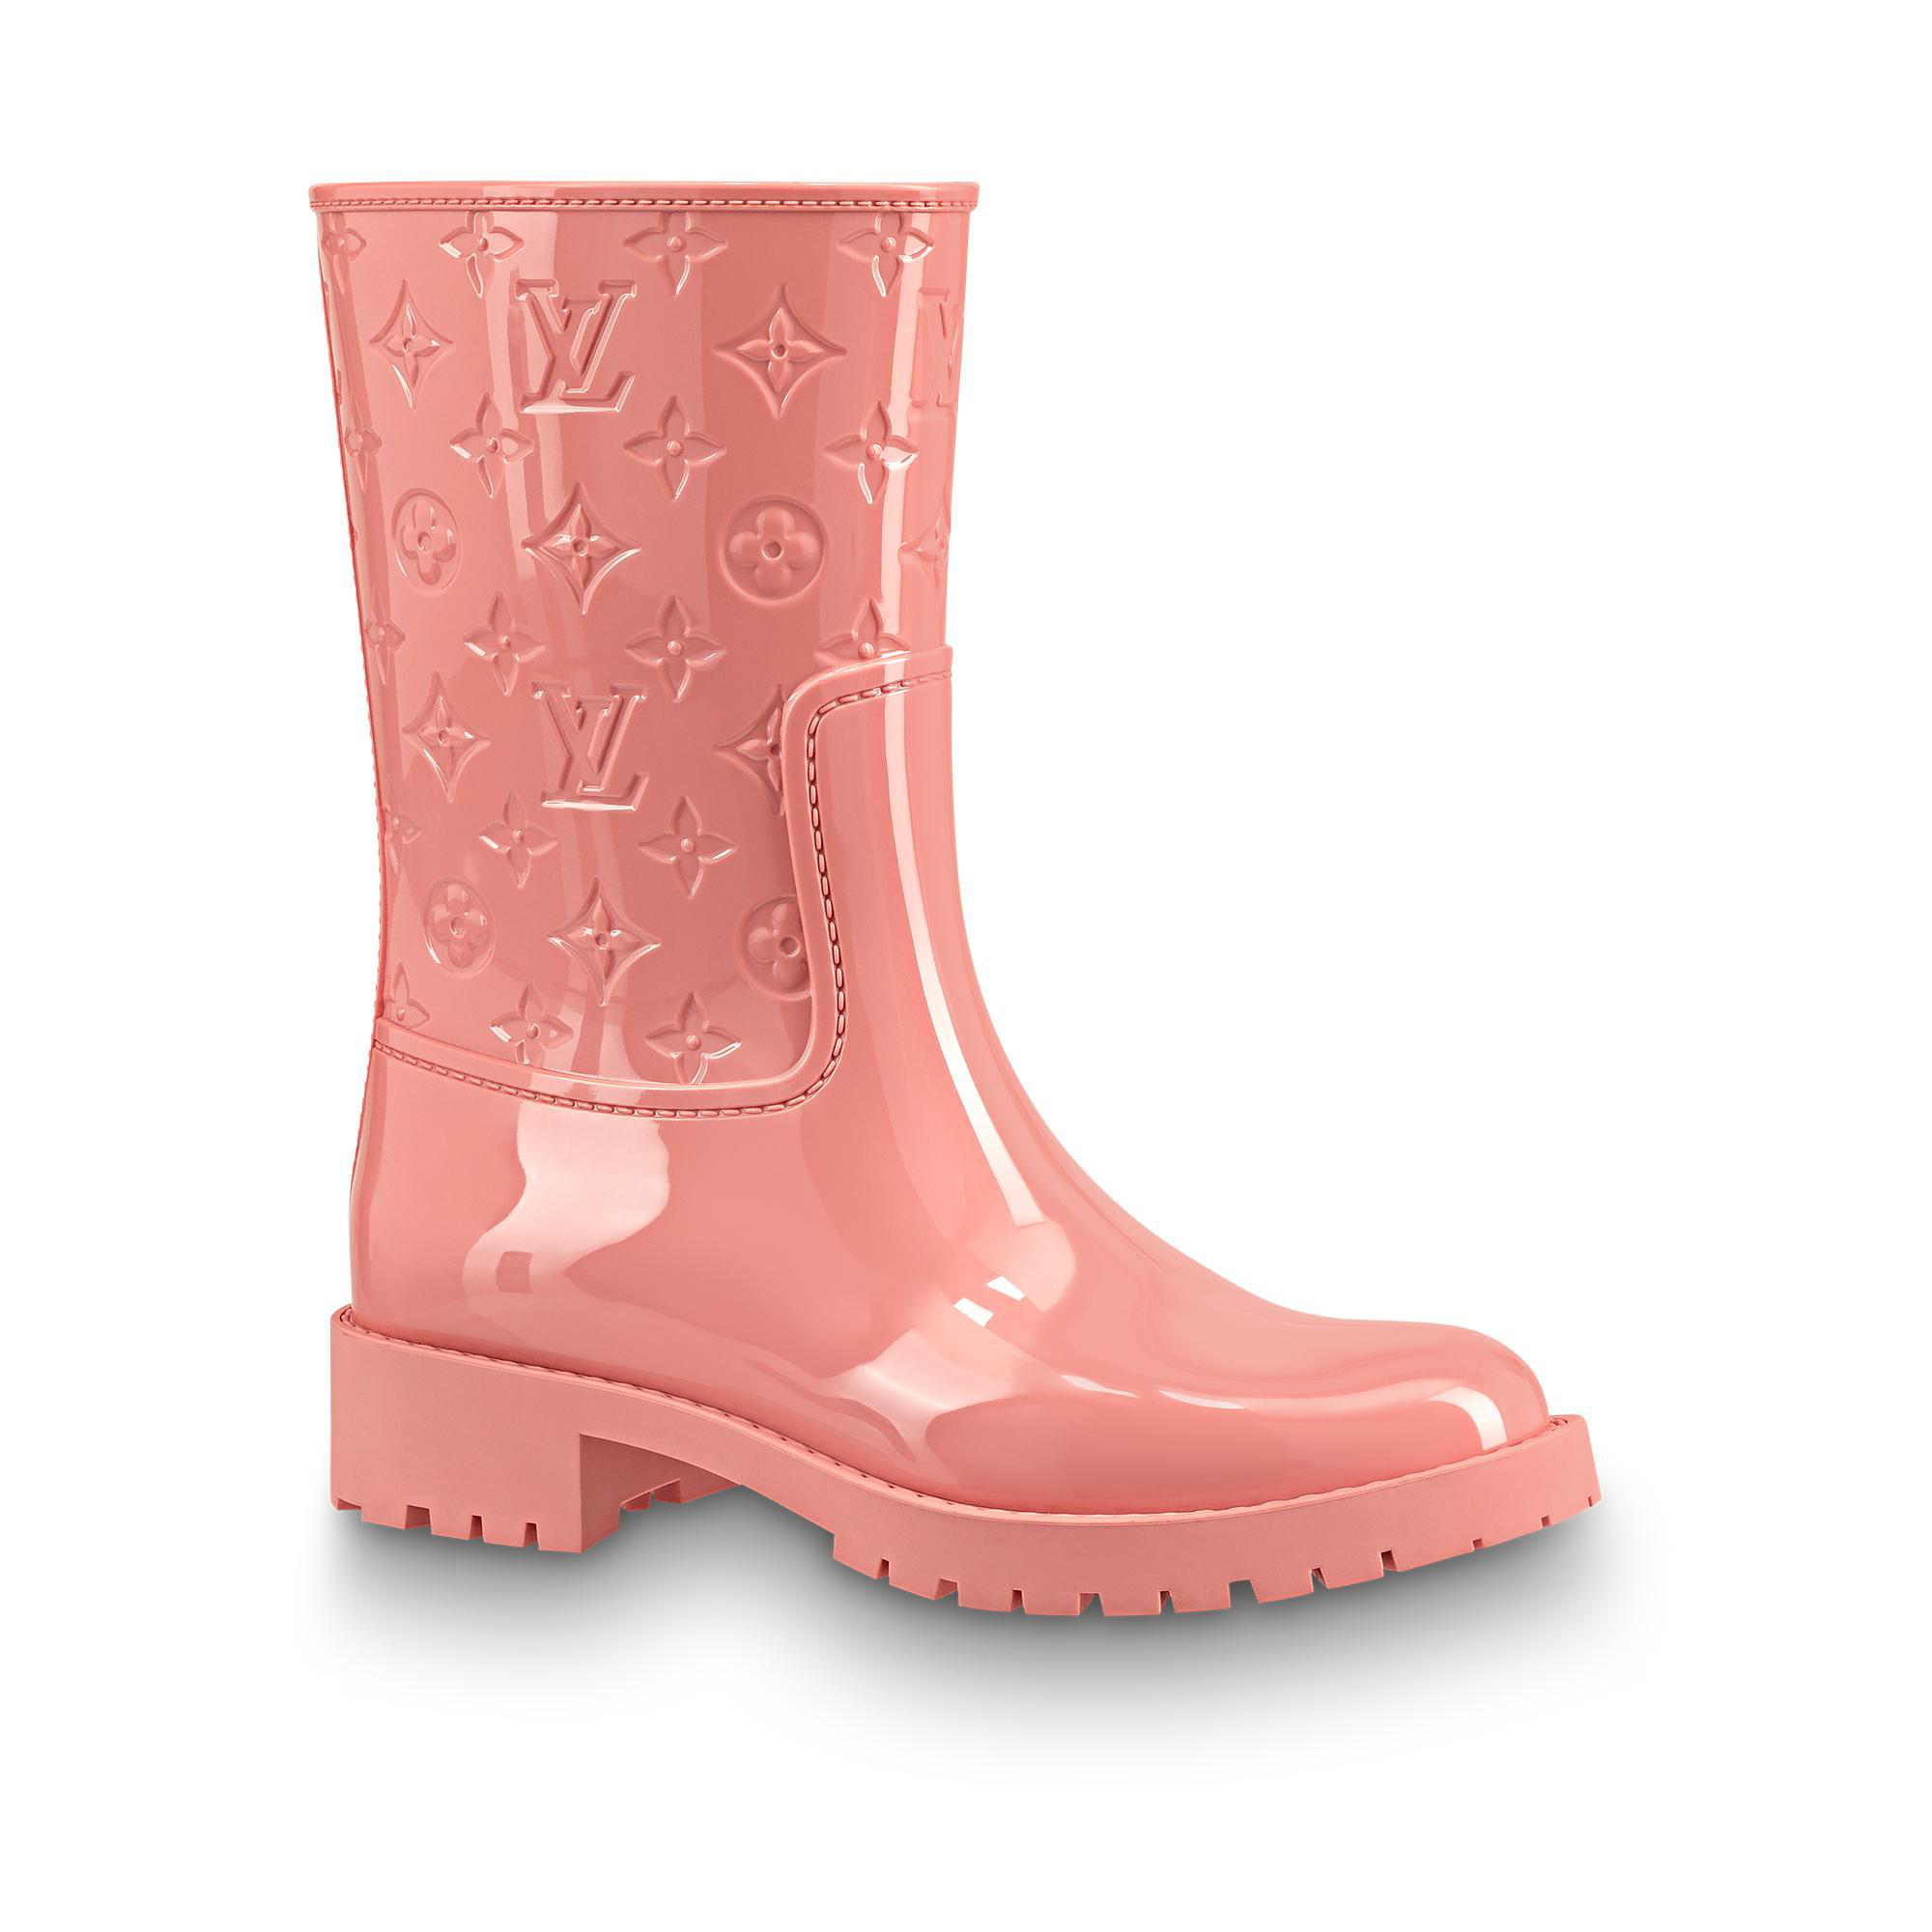 79a50daff921 Louis Vuitton Drops Flat Half Boot In Rose Clair